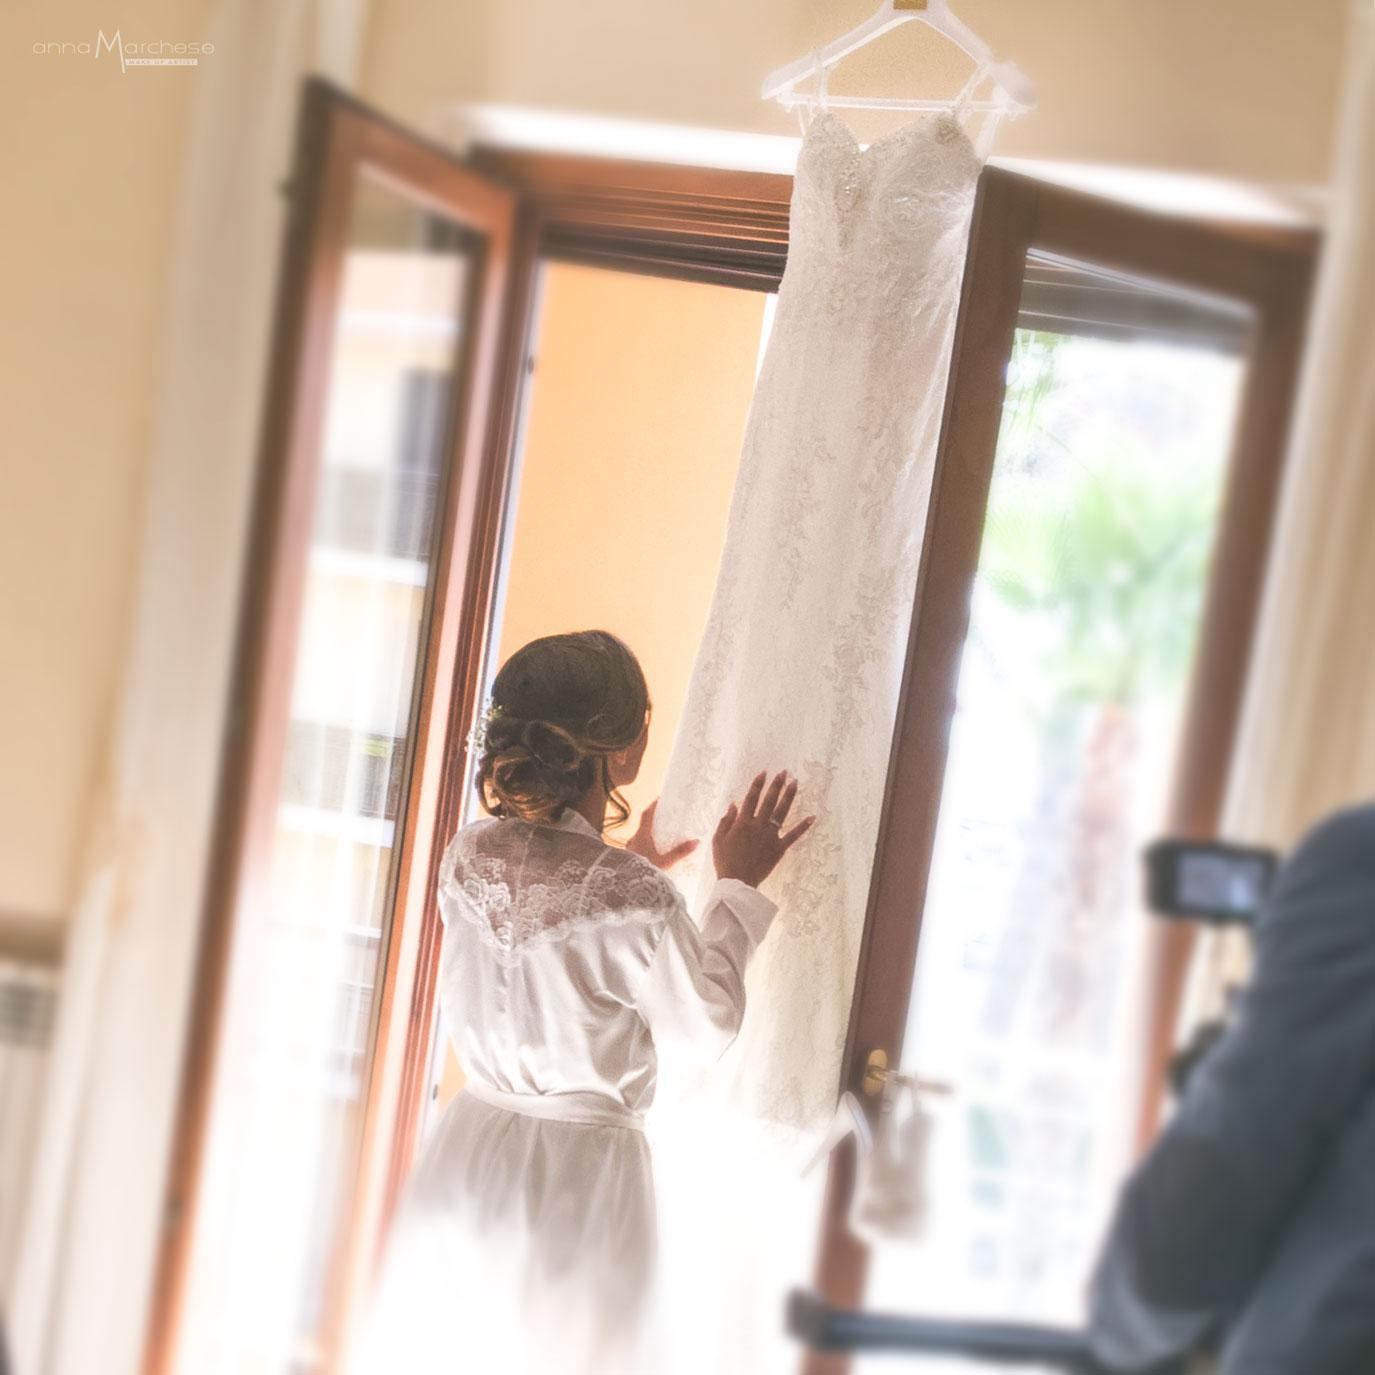 trucco-sposa-napoli-caserta-aversa-provincia-frattamaggiore-wedding-make-up-naples-bridal-makeupartist-bride-look